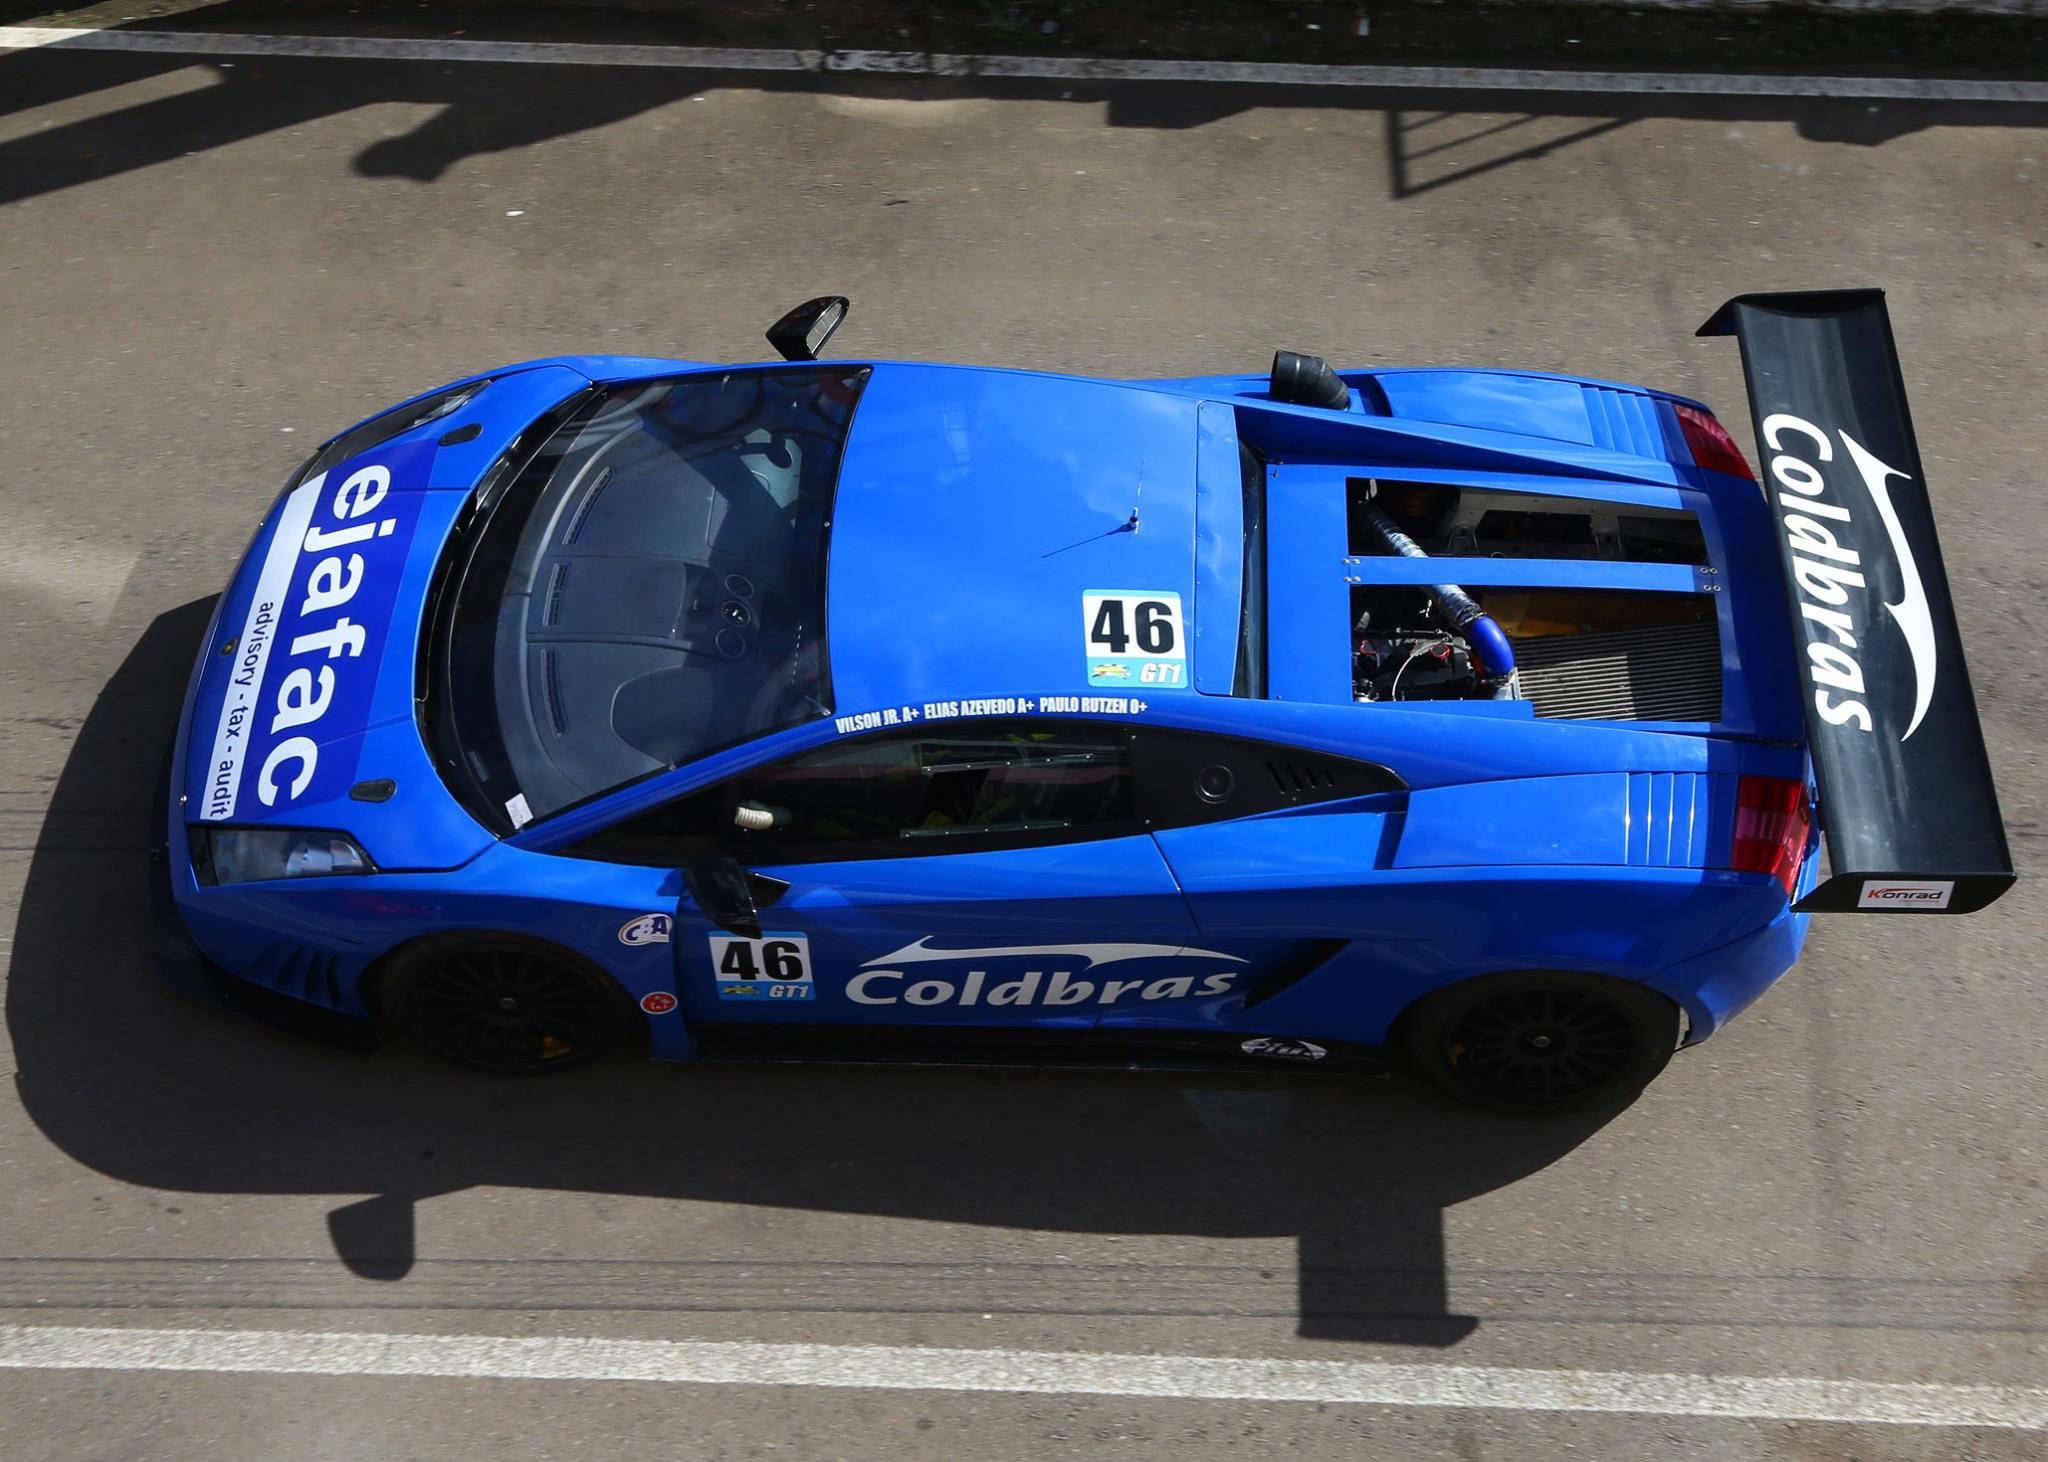 Lamborghini Gallardo With A Turbocharged Vw Inline Four Engine